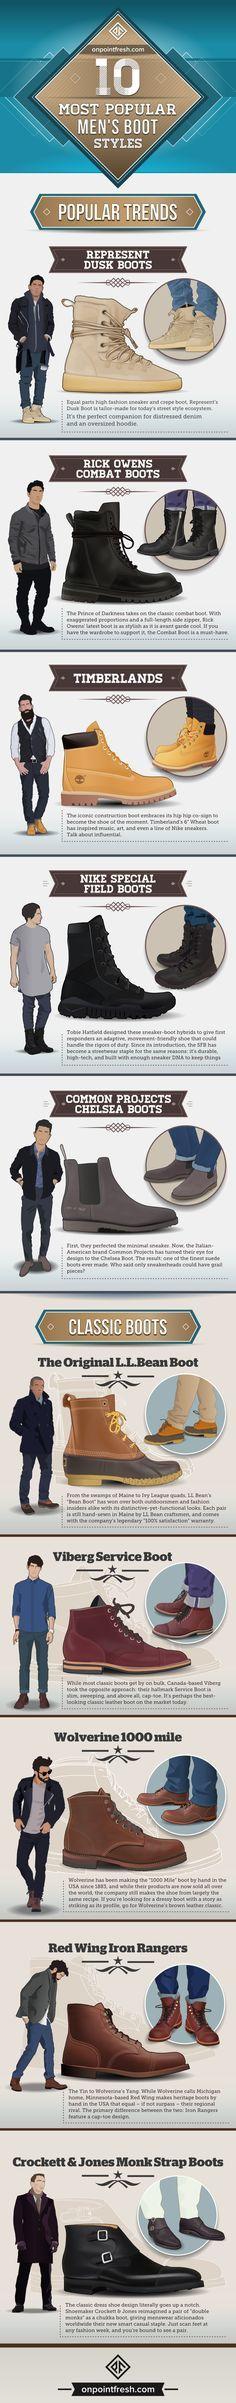 mens boots infographic. Find your Inspiration @ #DapperNDame Pinterest. dapperanddame.com